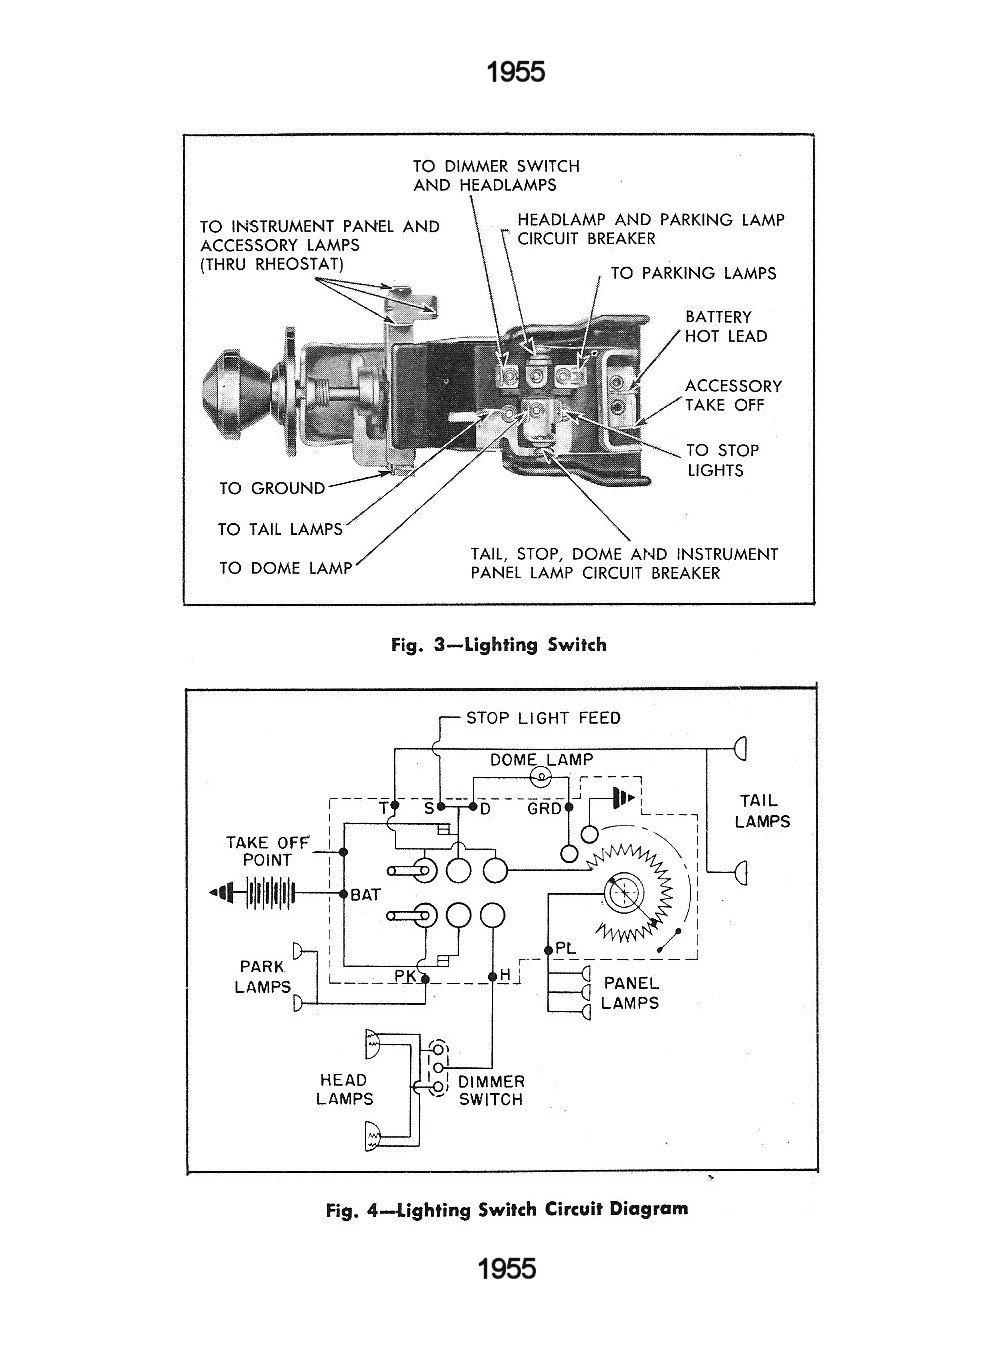 universal headlamp switch wiring diagram wiring diagram 78Universal Headlight Wiring Diagram #7